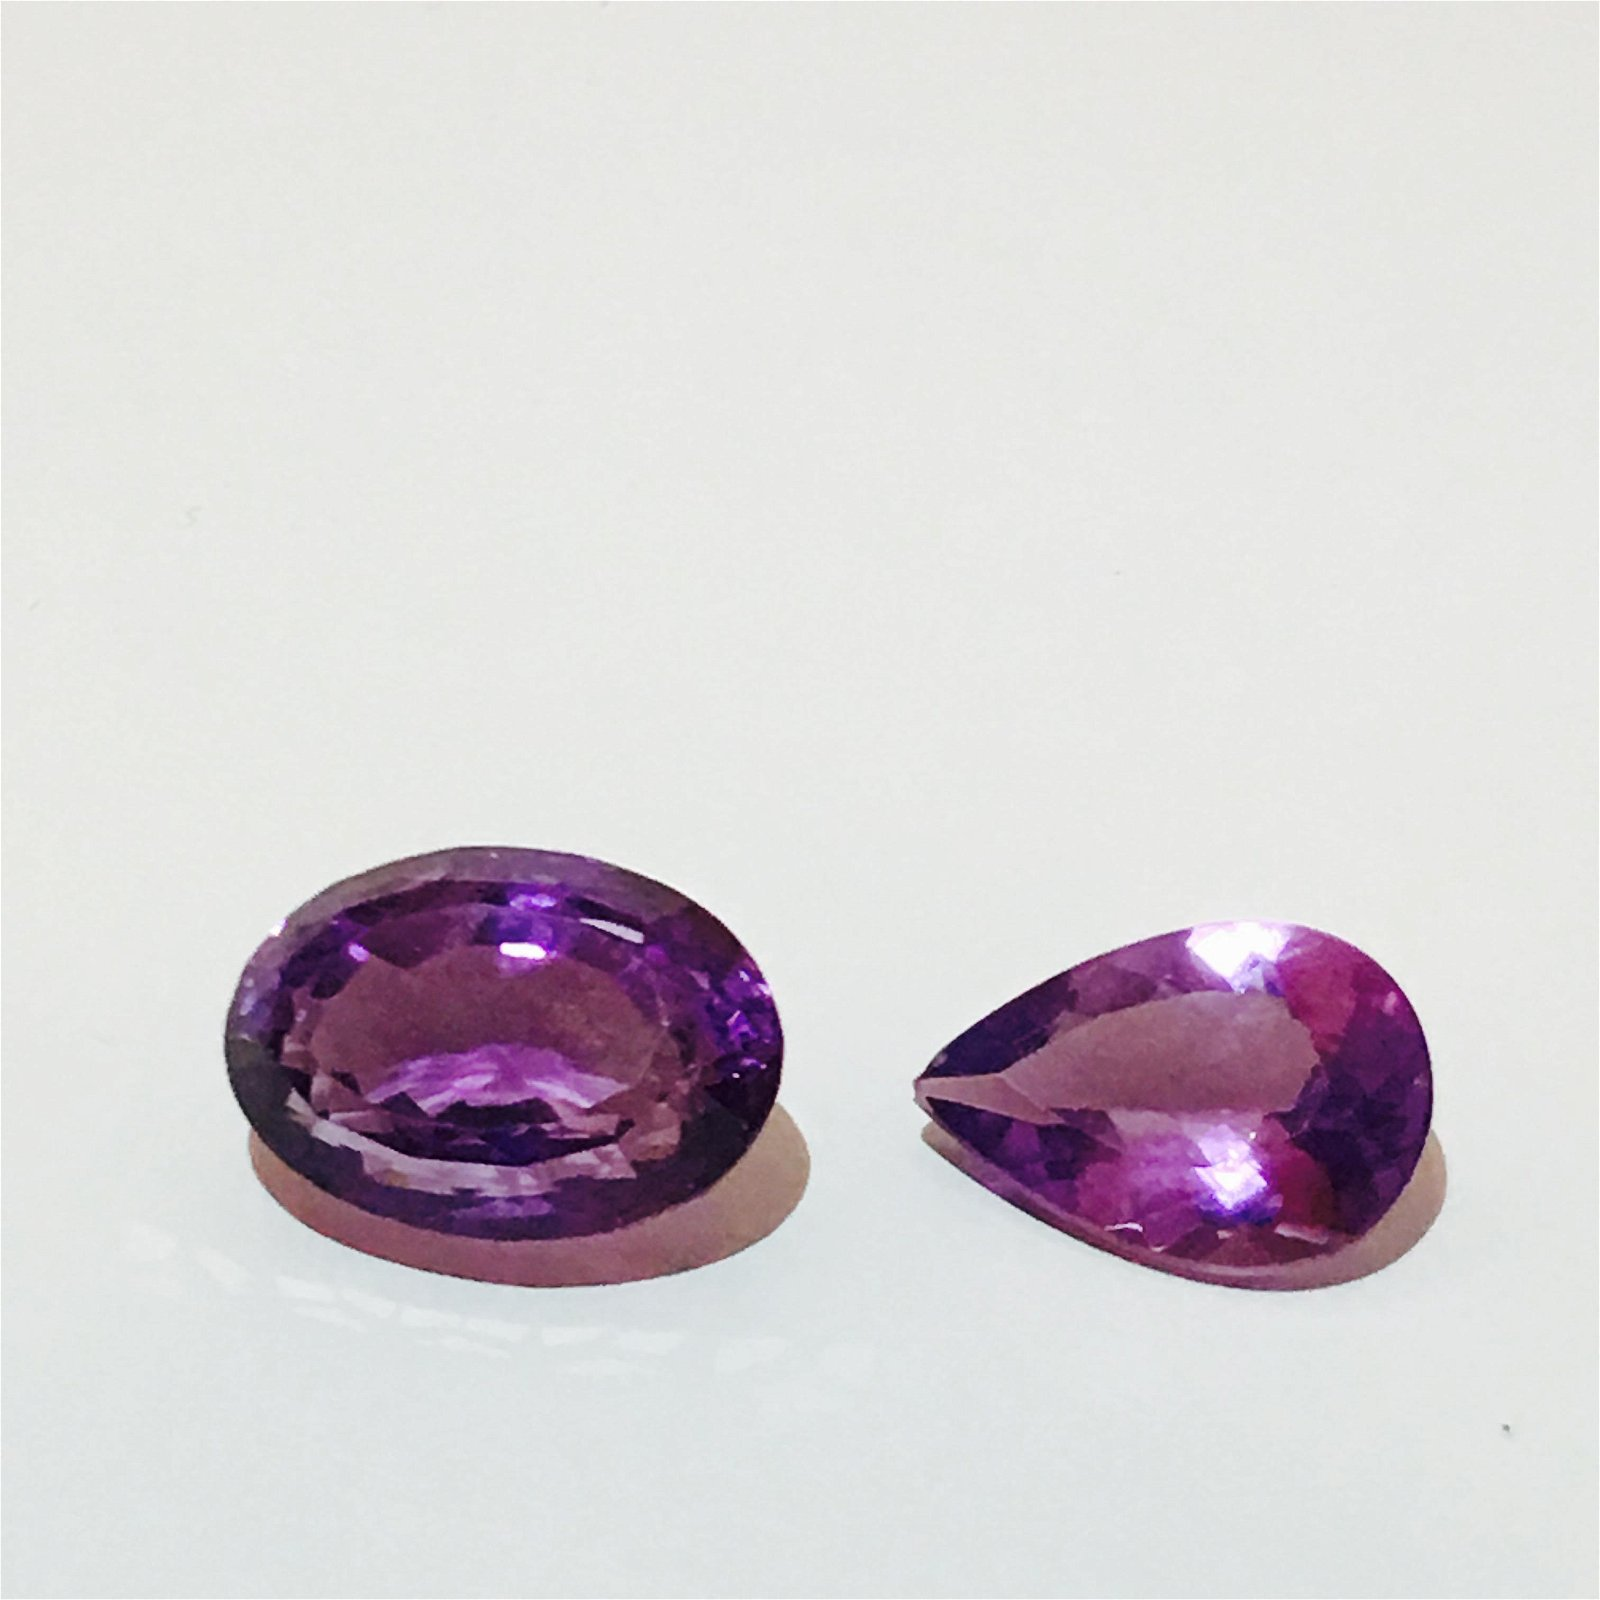 15.55 carat Amethyst! 100% natural. AAA color and cut.